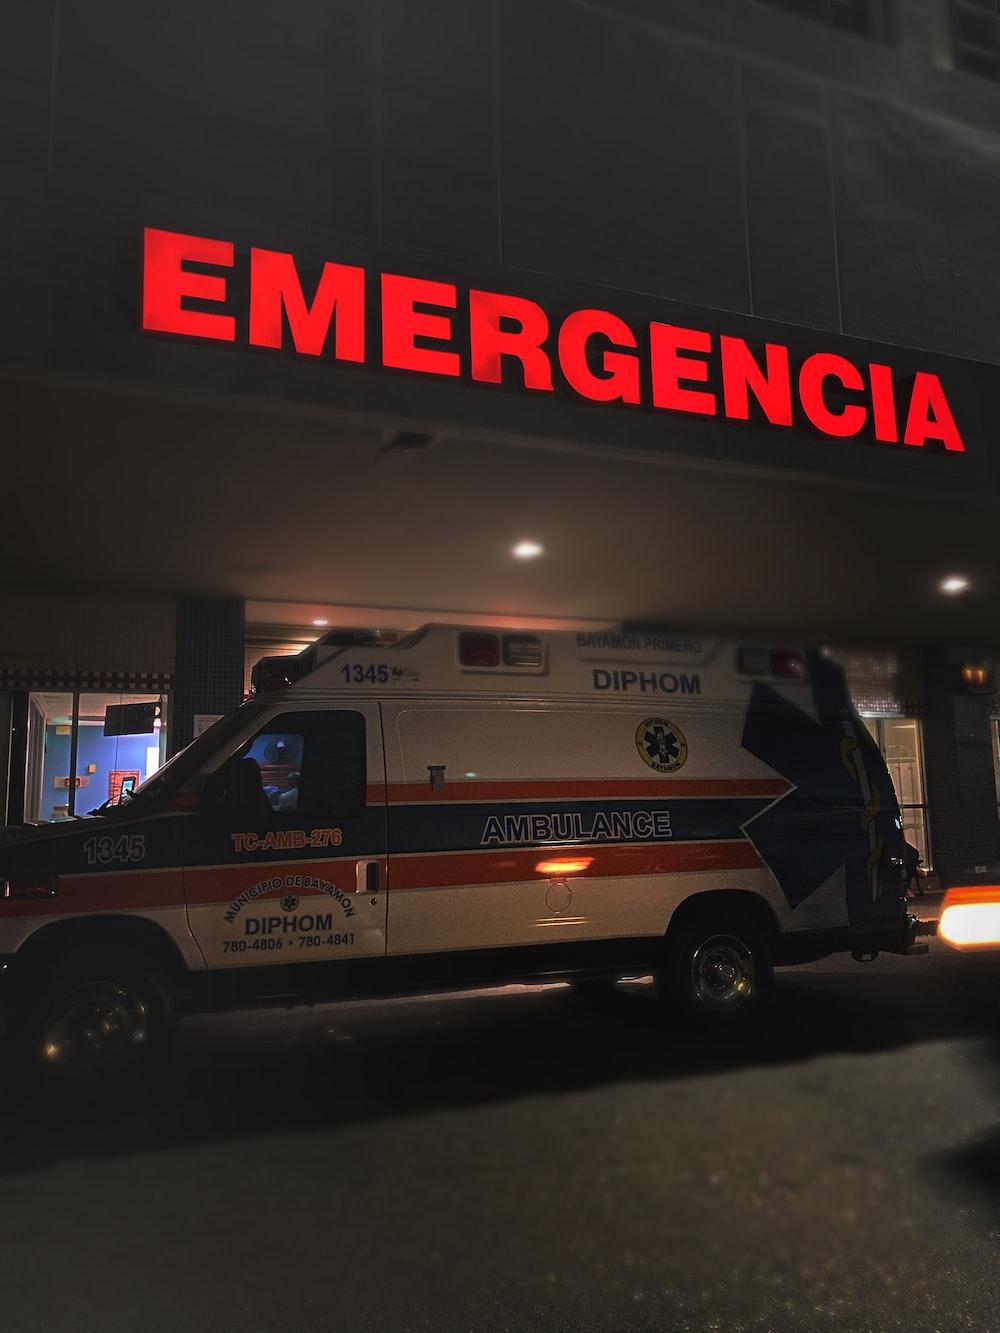 white and red ambulance van